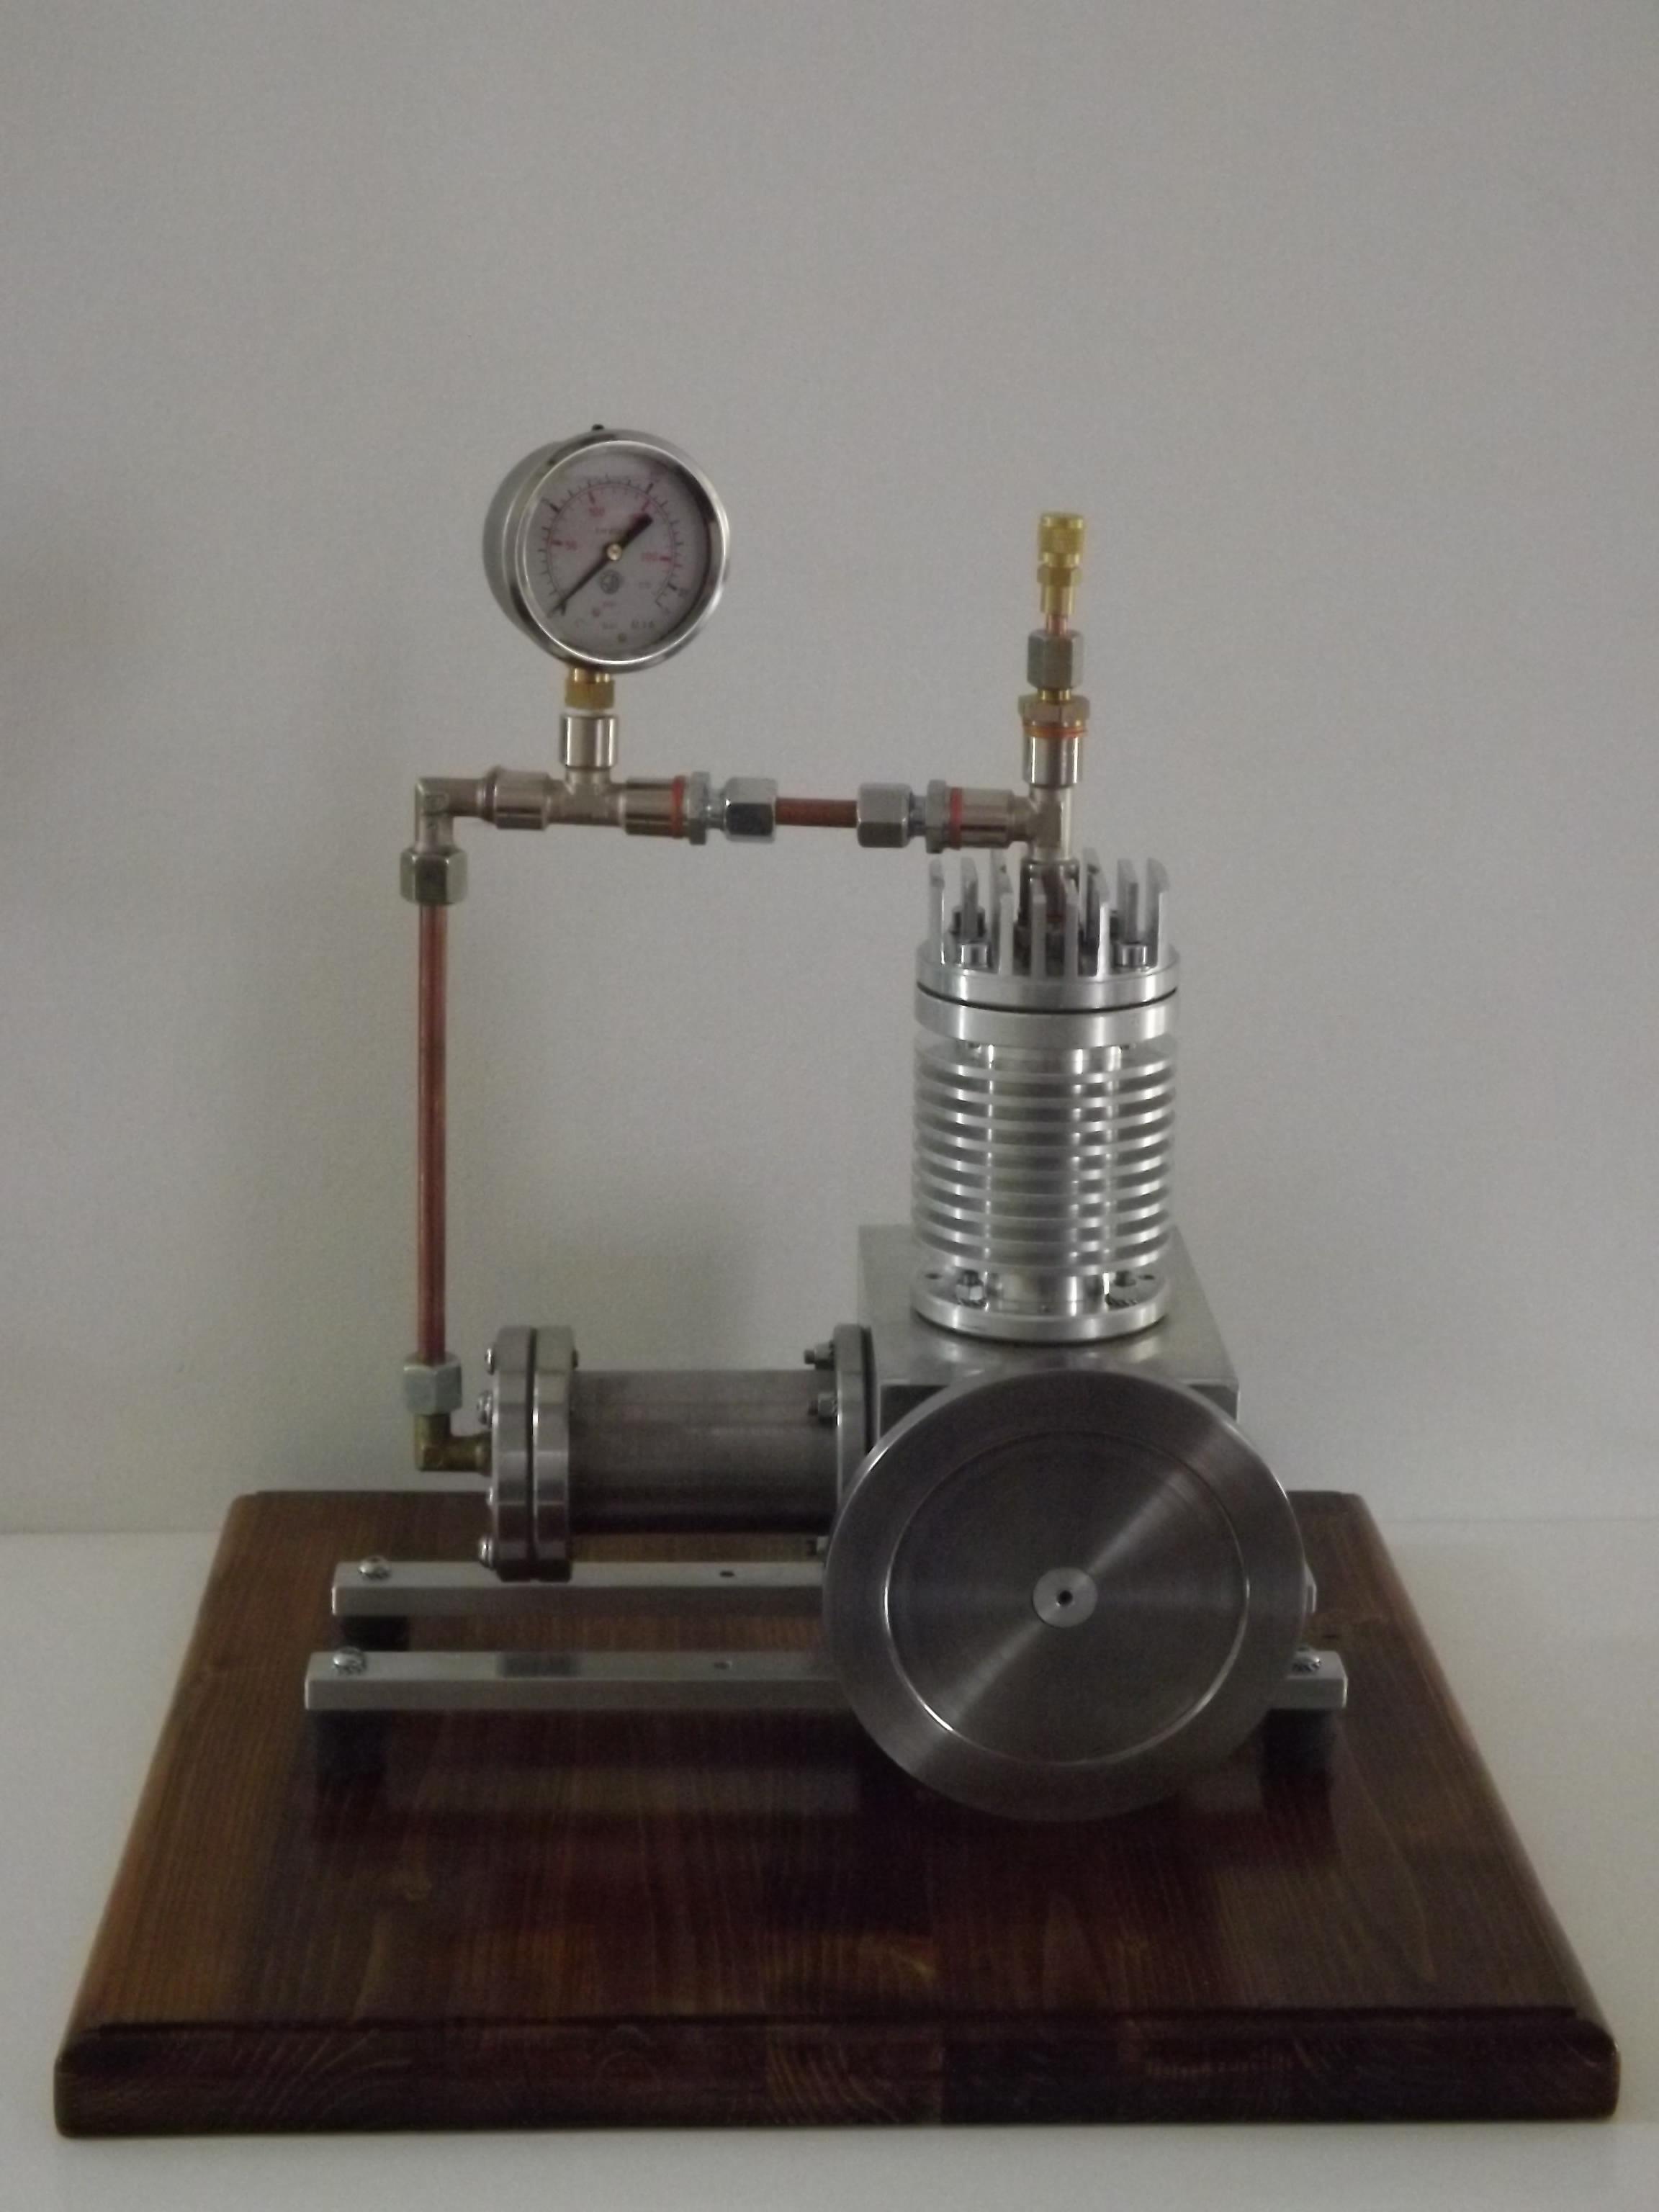 Caldaia Elettrica Per Riscaldamento  pannelli solari termo3t, caldaie elettriche elterm ...